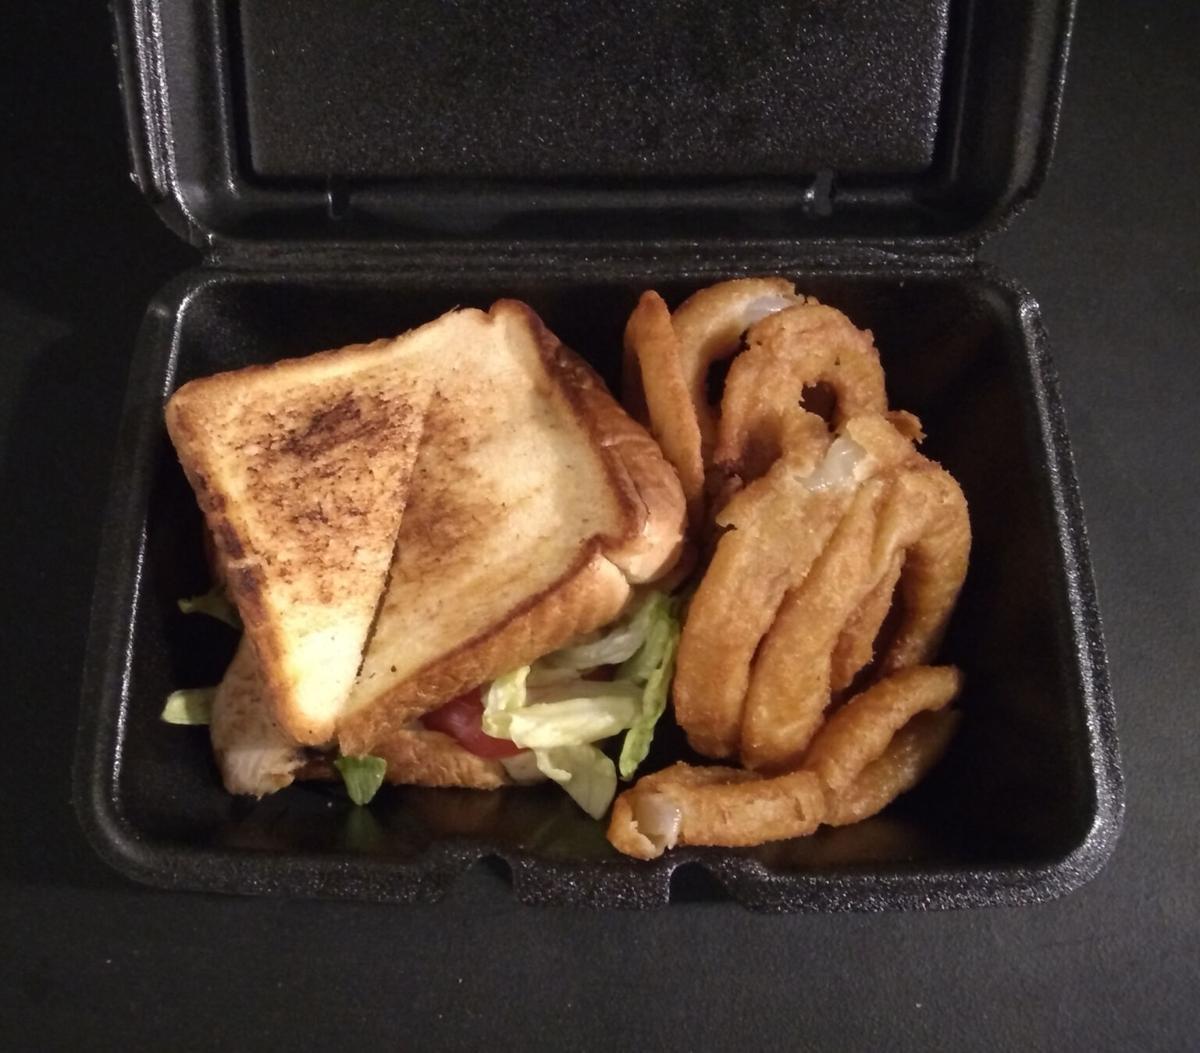 Tasty sandwich at Auburn restaurant